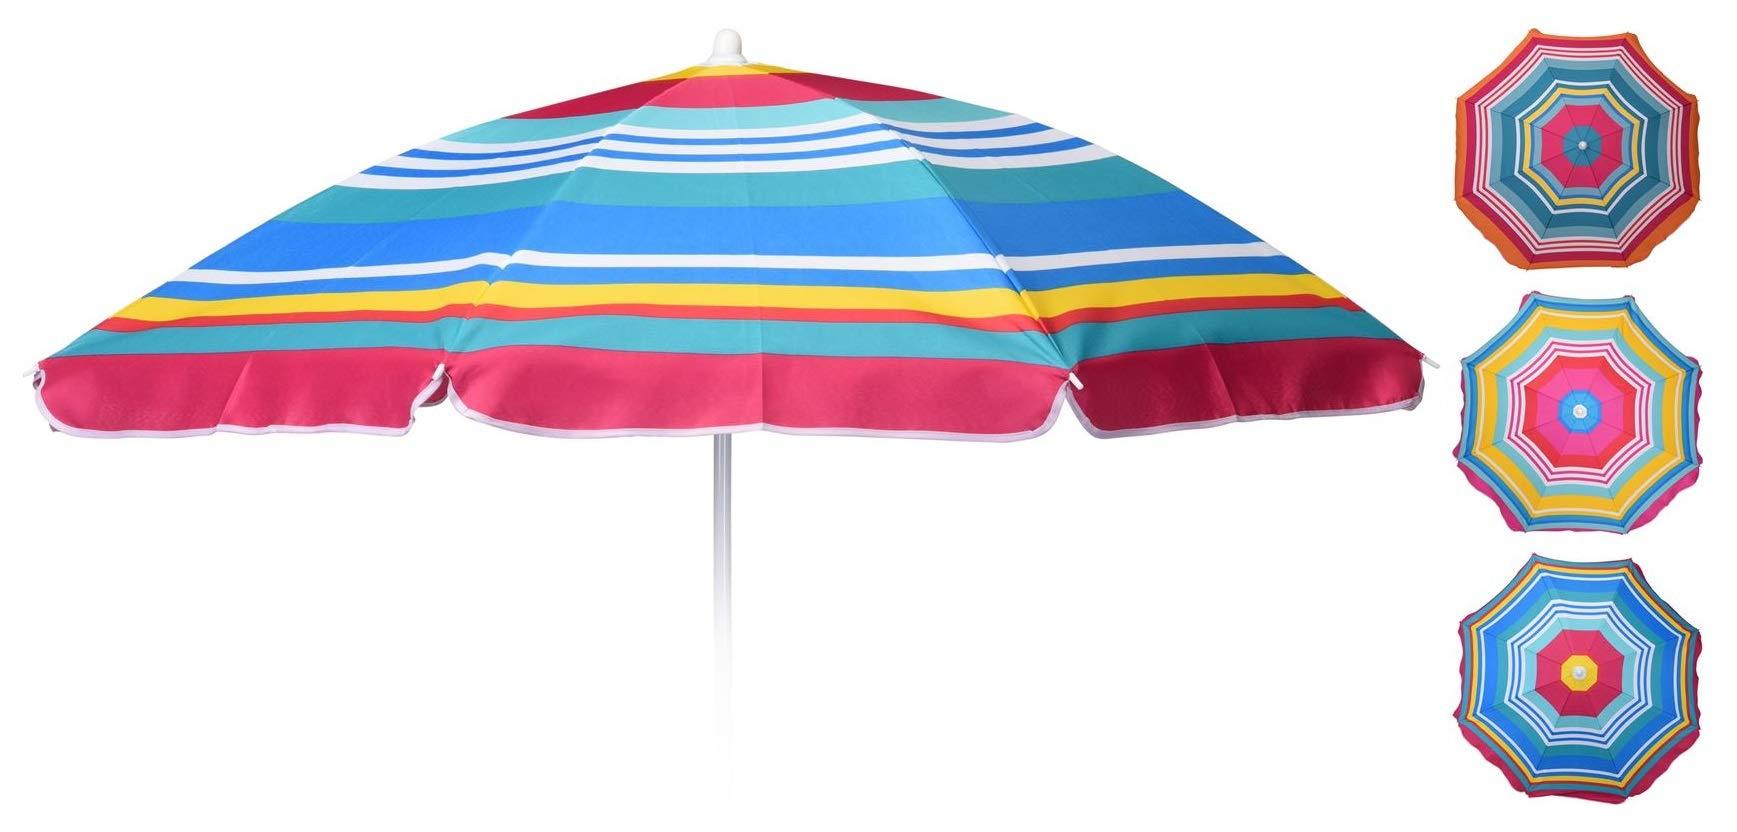 ® Strandschirm Ø140cm Creme Sonnenschirm Schirm Gartenschirm UV Schutz casa.pro